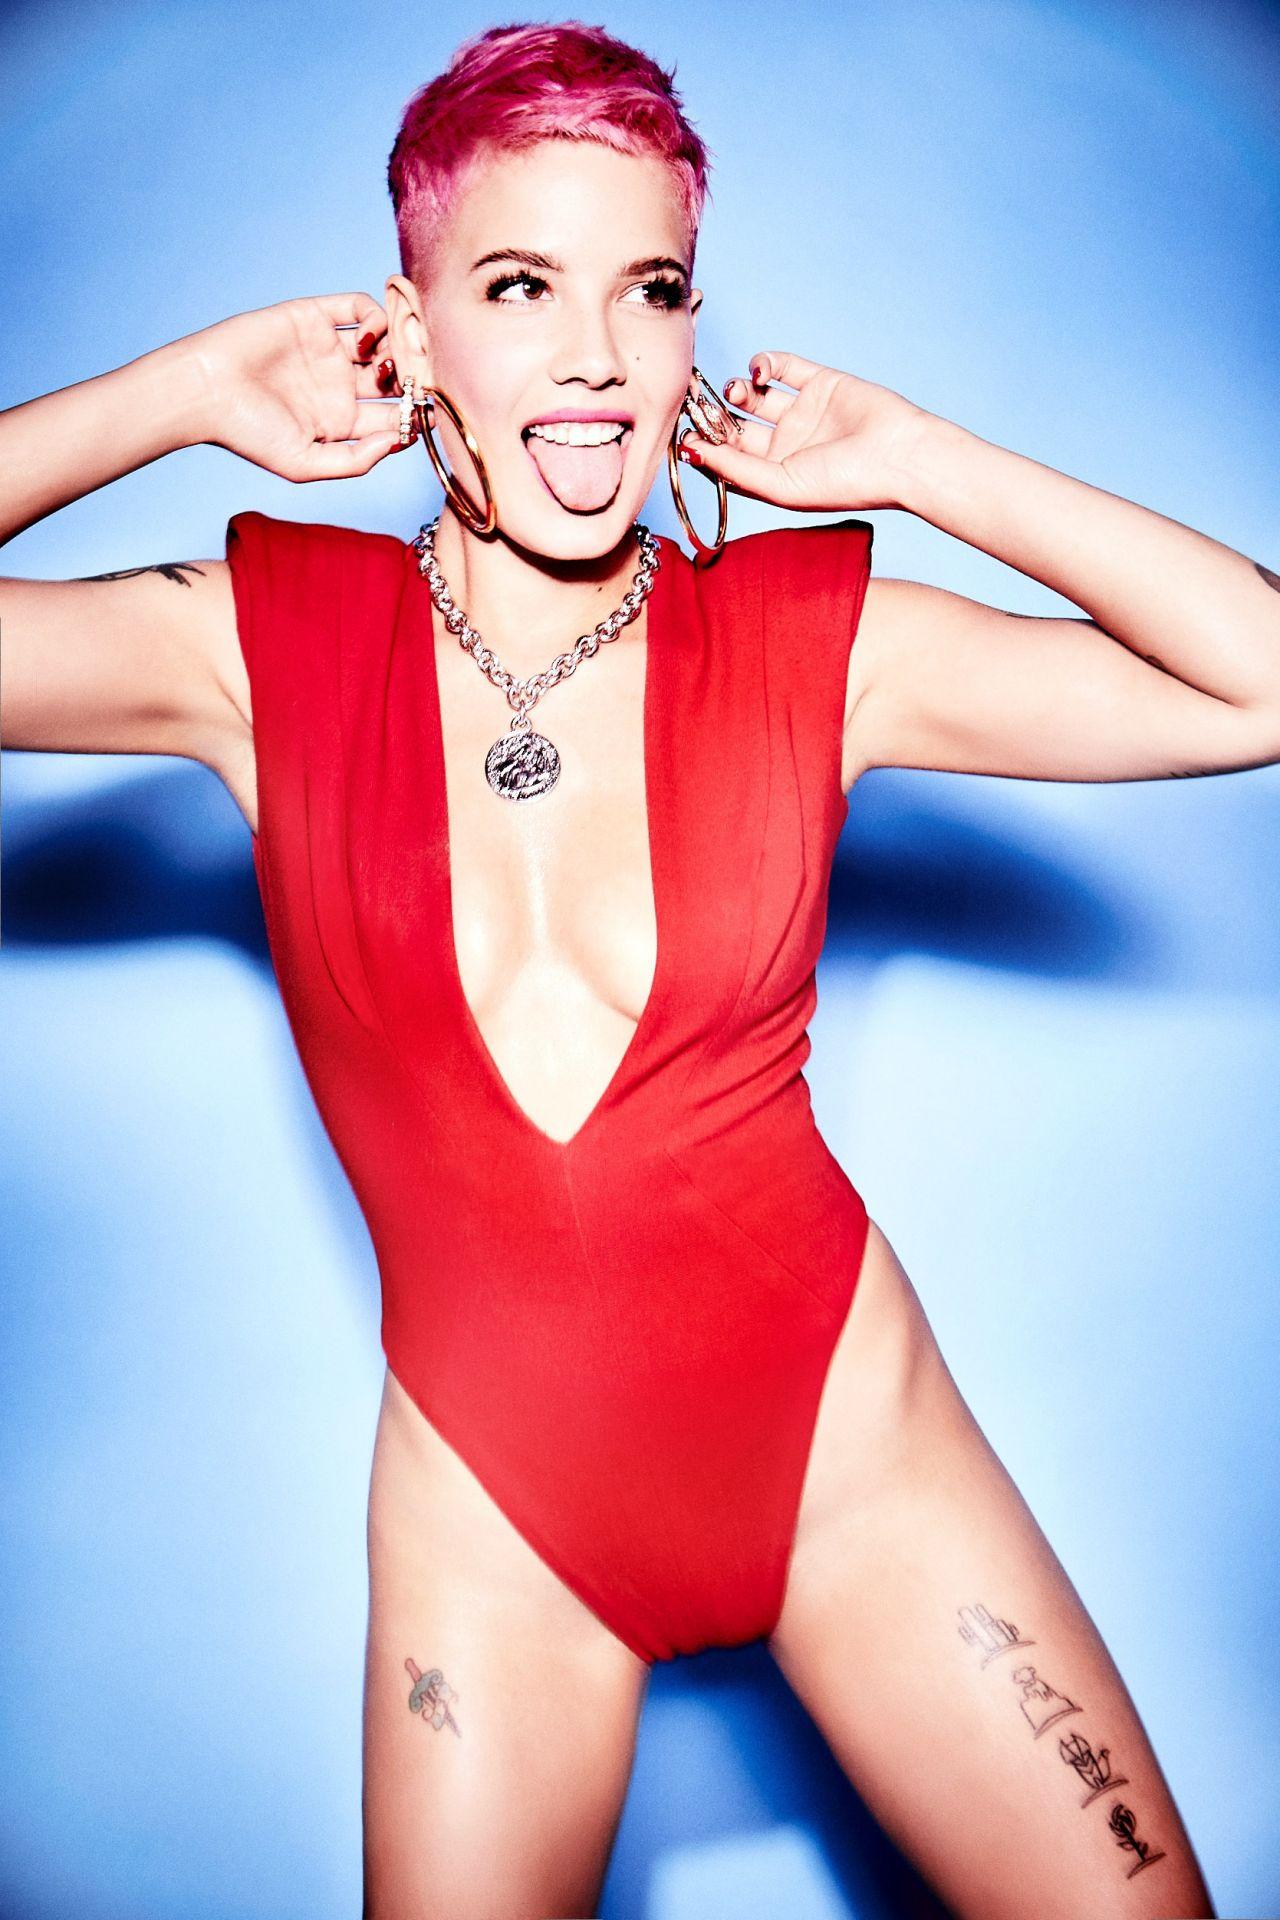 Miley cyrus snl - 1 part 8